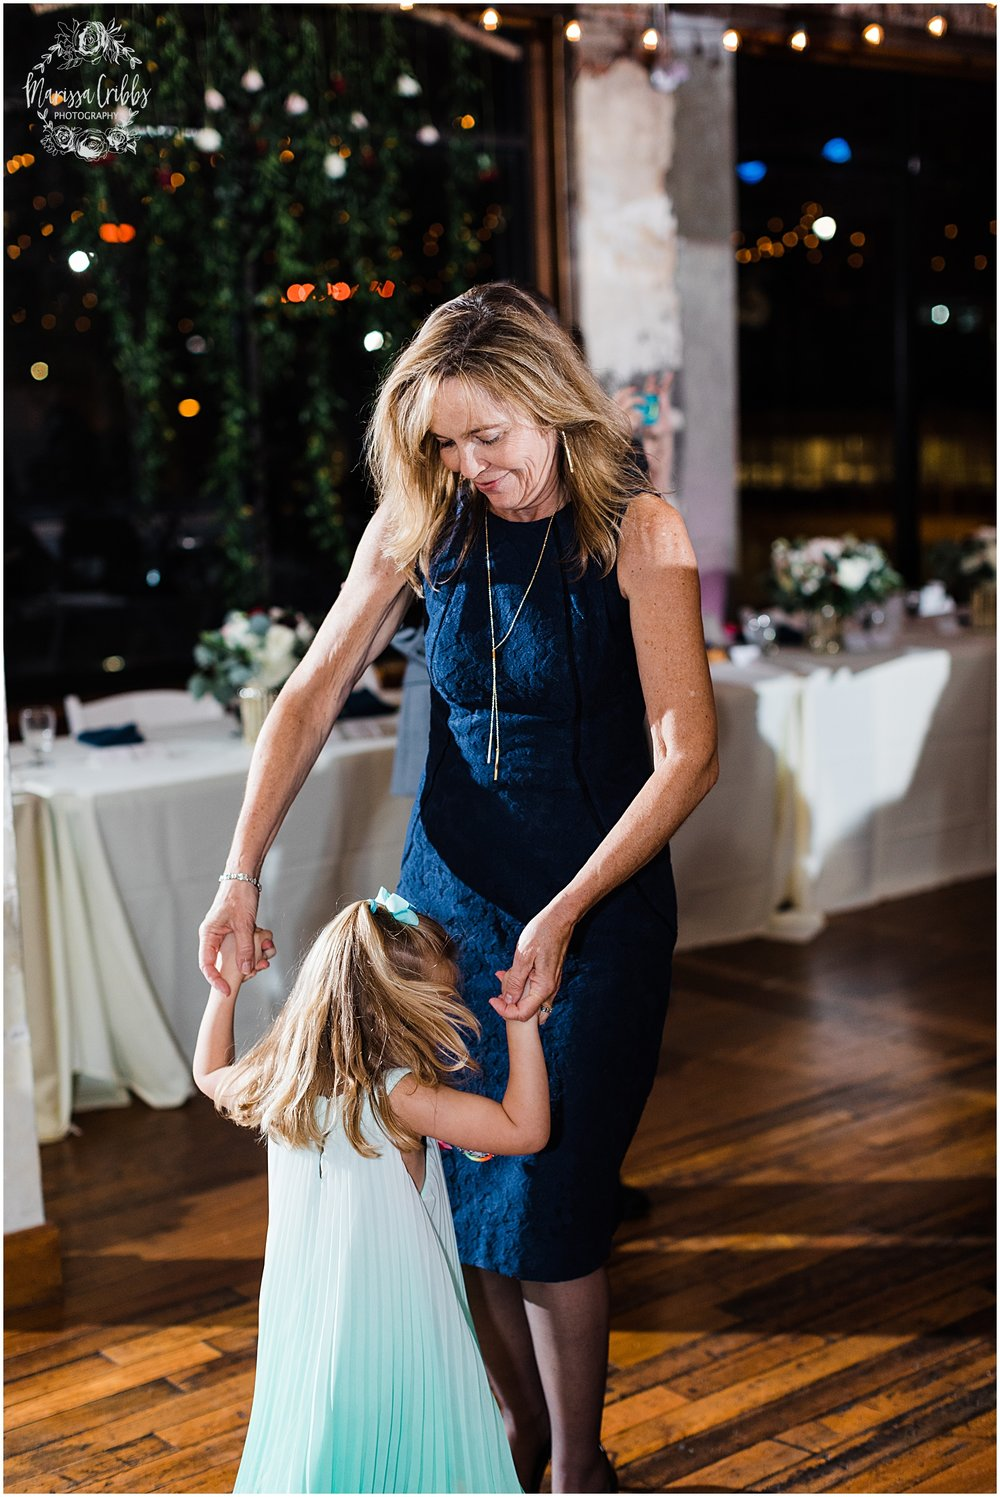 BAUER WEDDING | KELSEA & JUSTIN | MARISSA CRIBBS PHOTOGRAPHY_6607.jpg